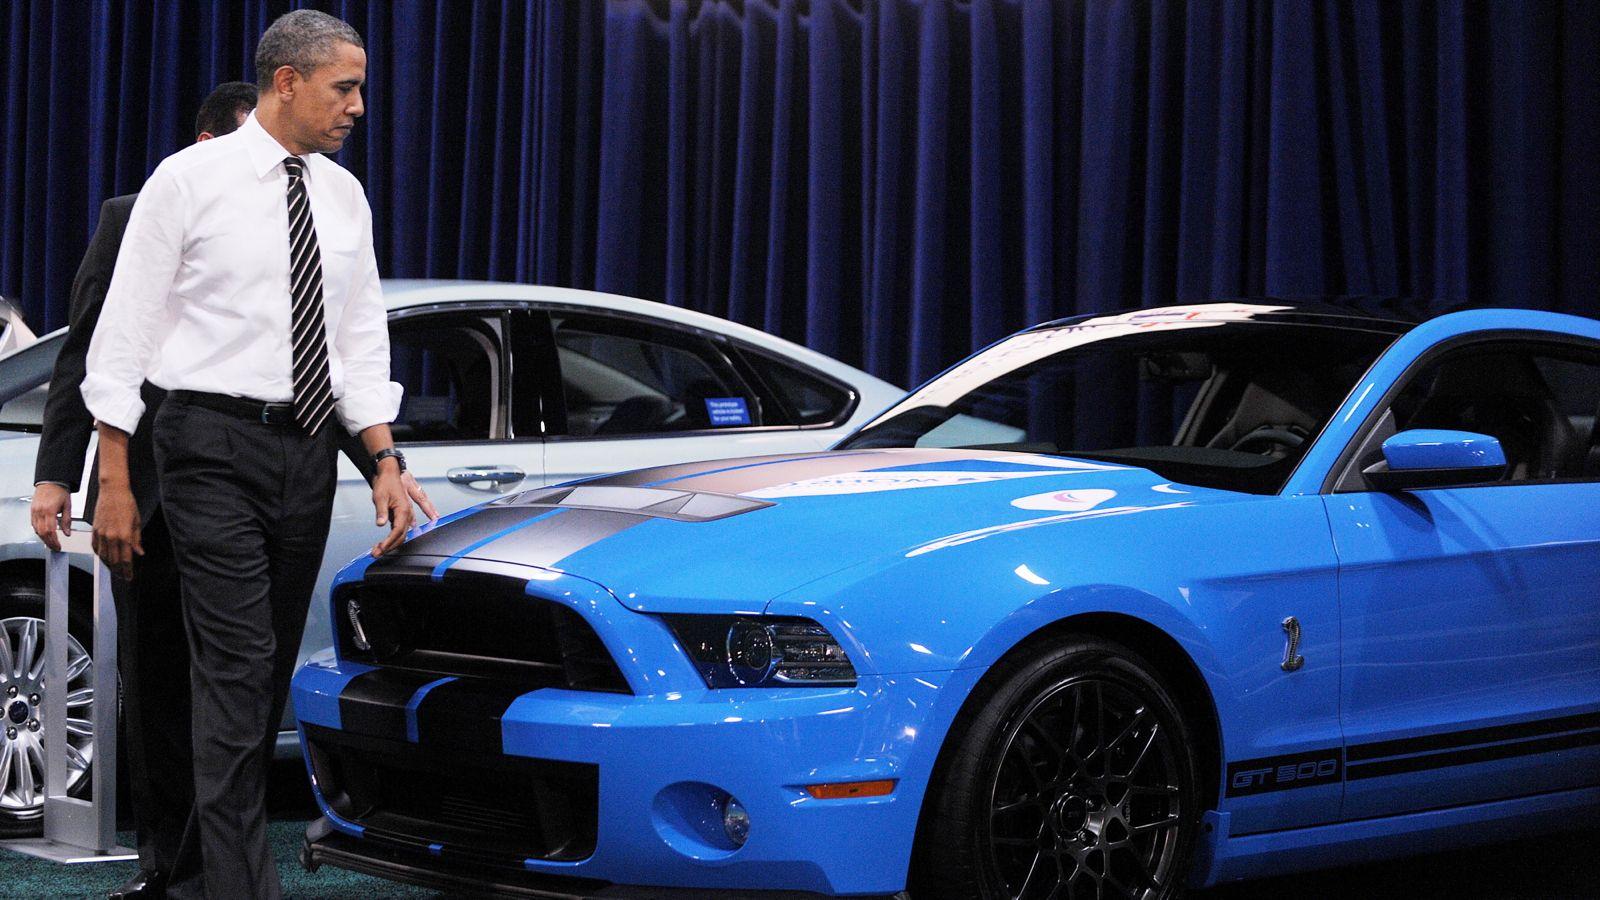 Barack obama praises the 2013 shelby gt500 autoevolution